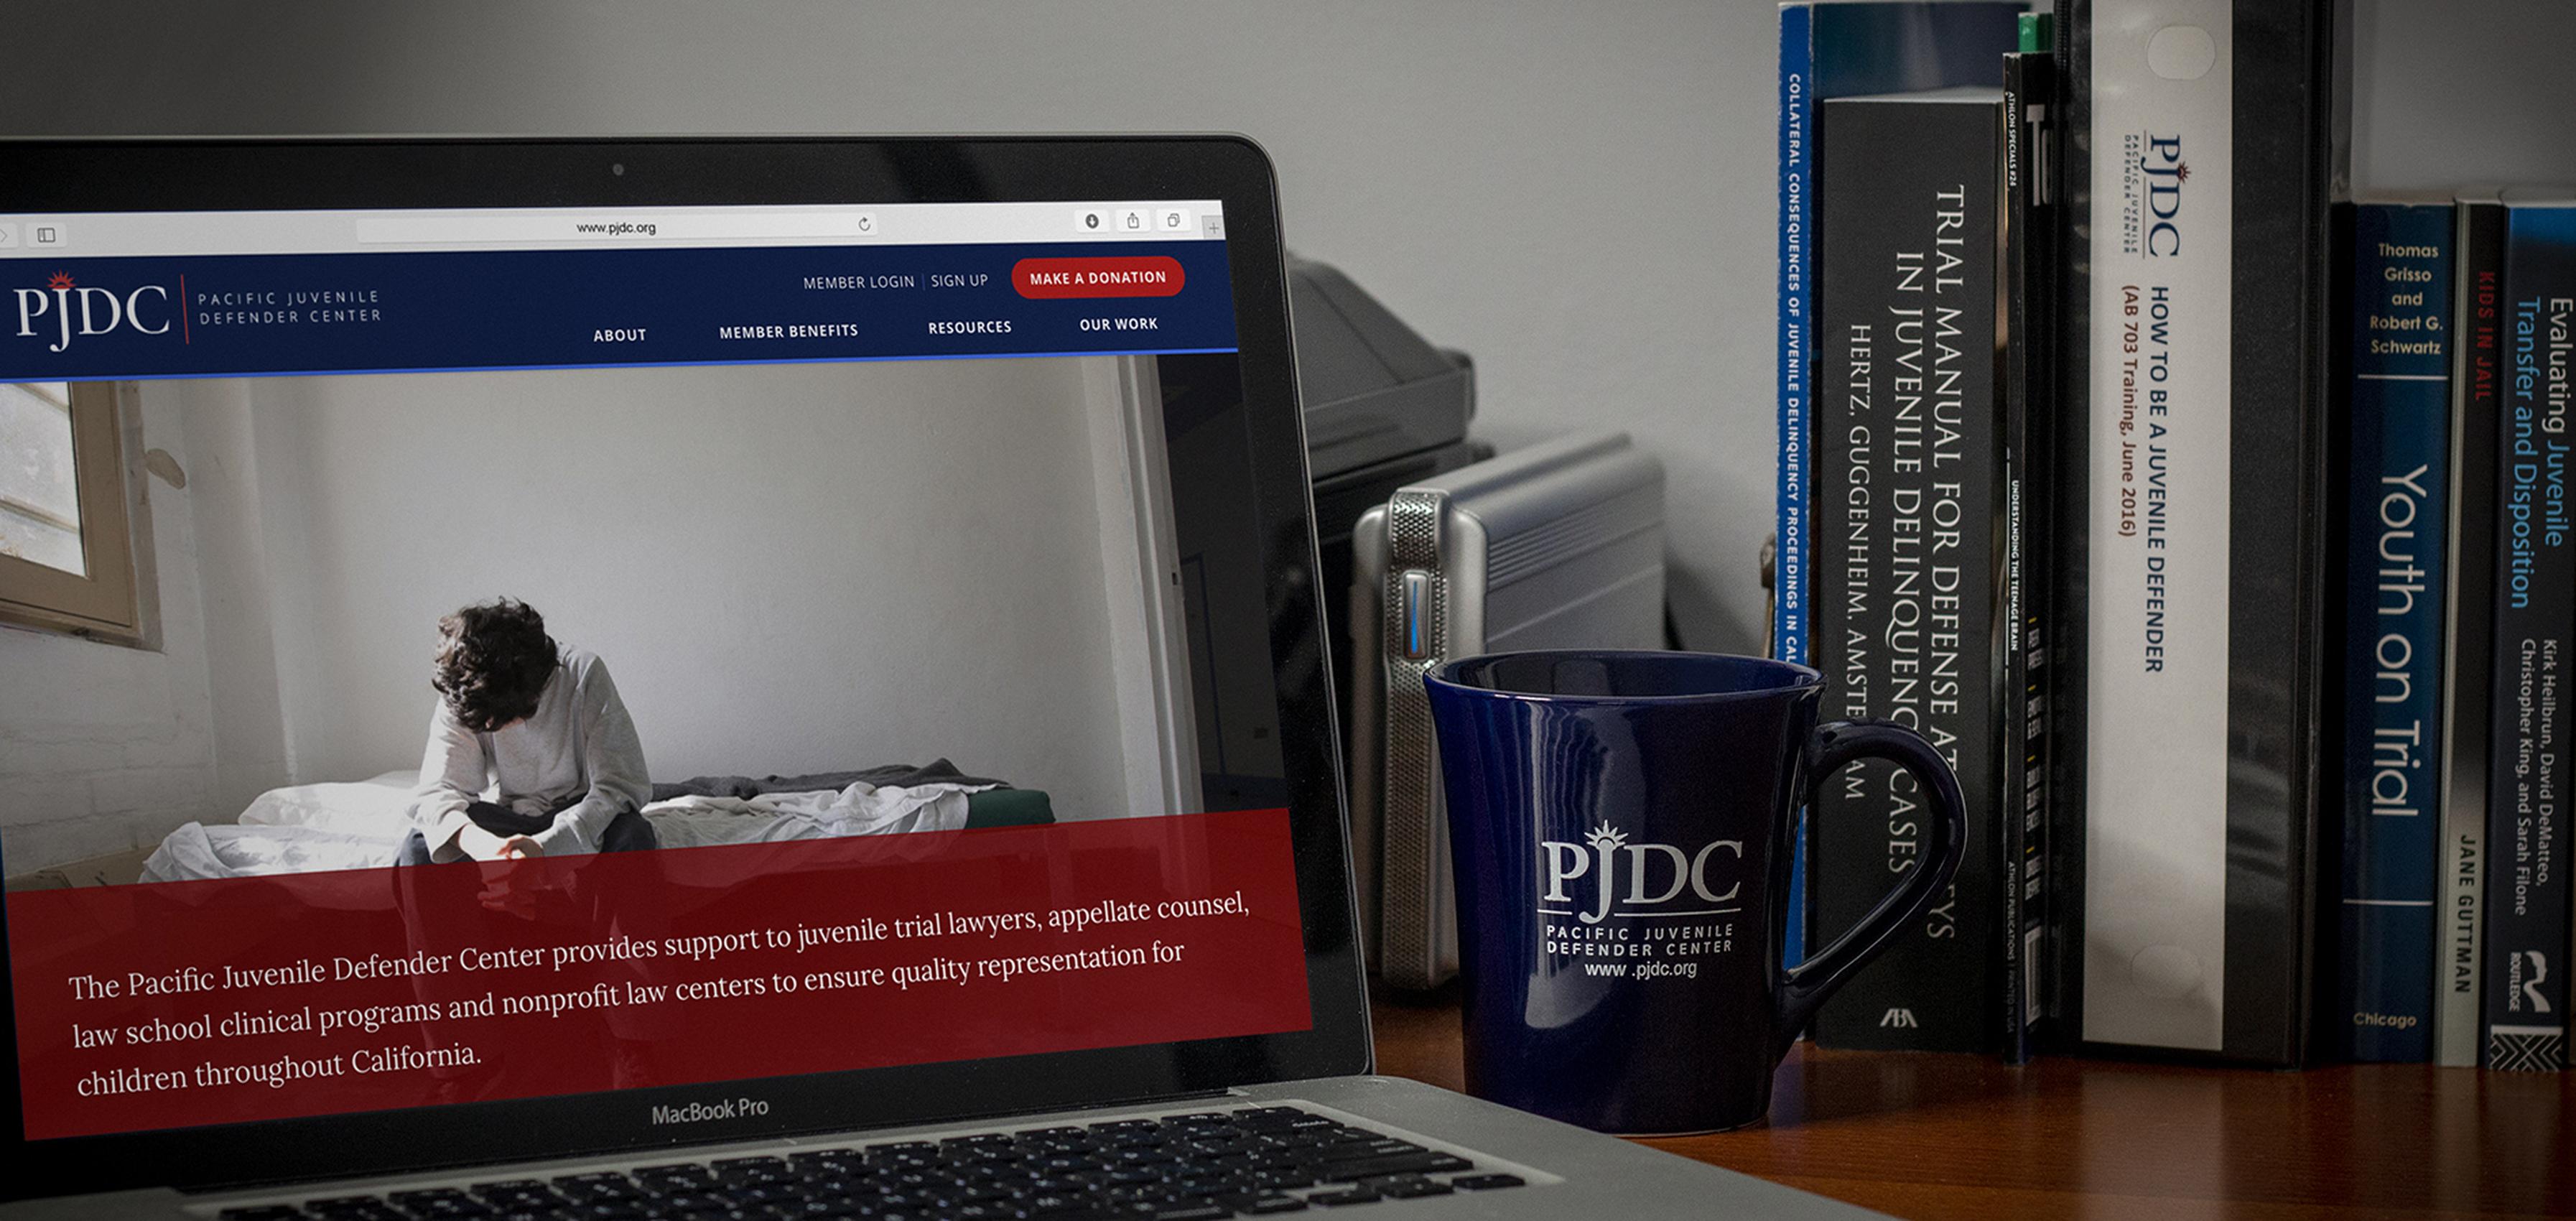 PJDC Training Videos